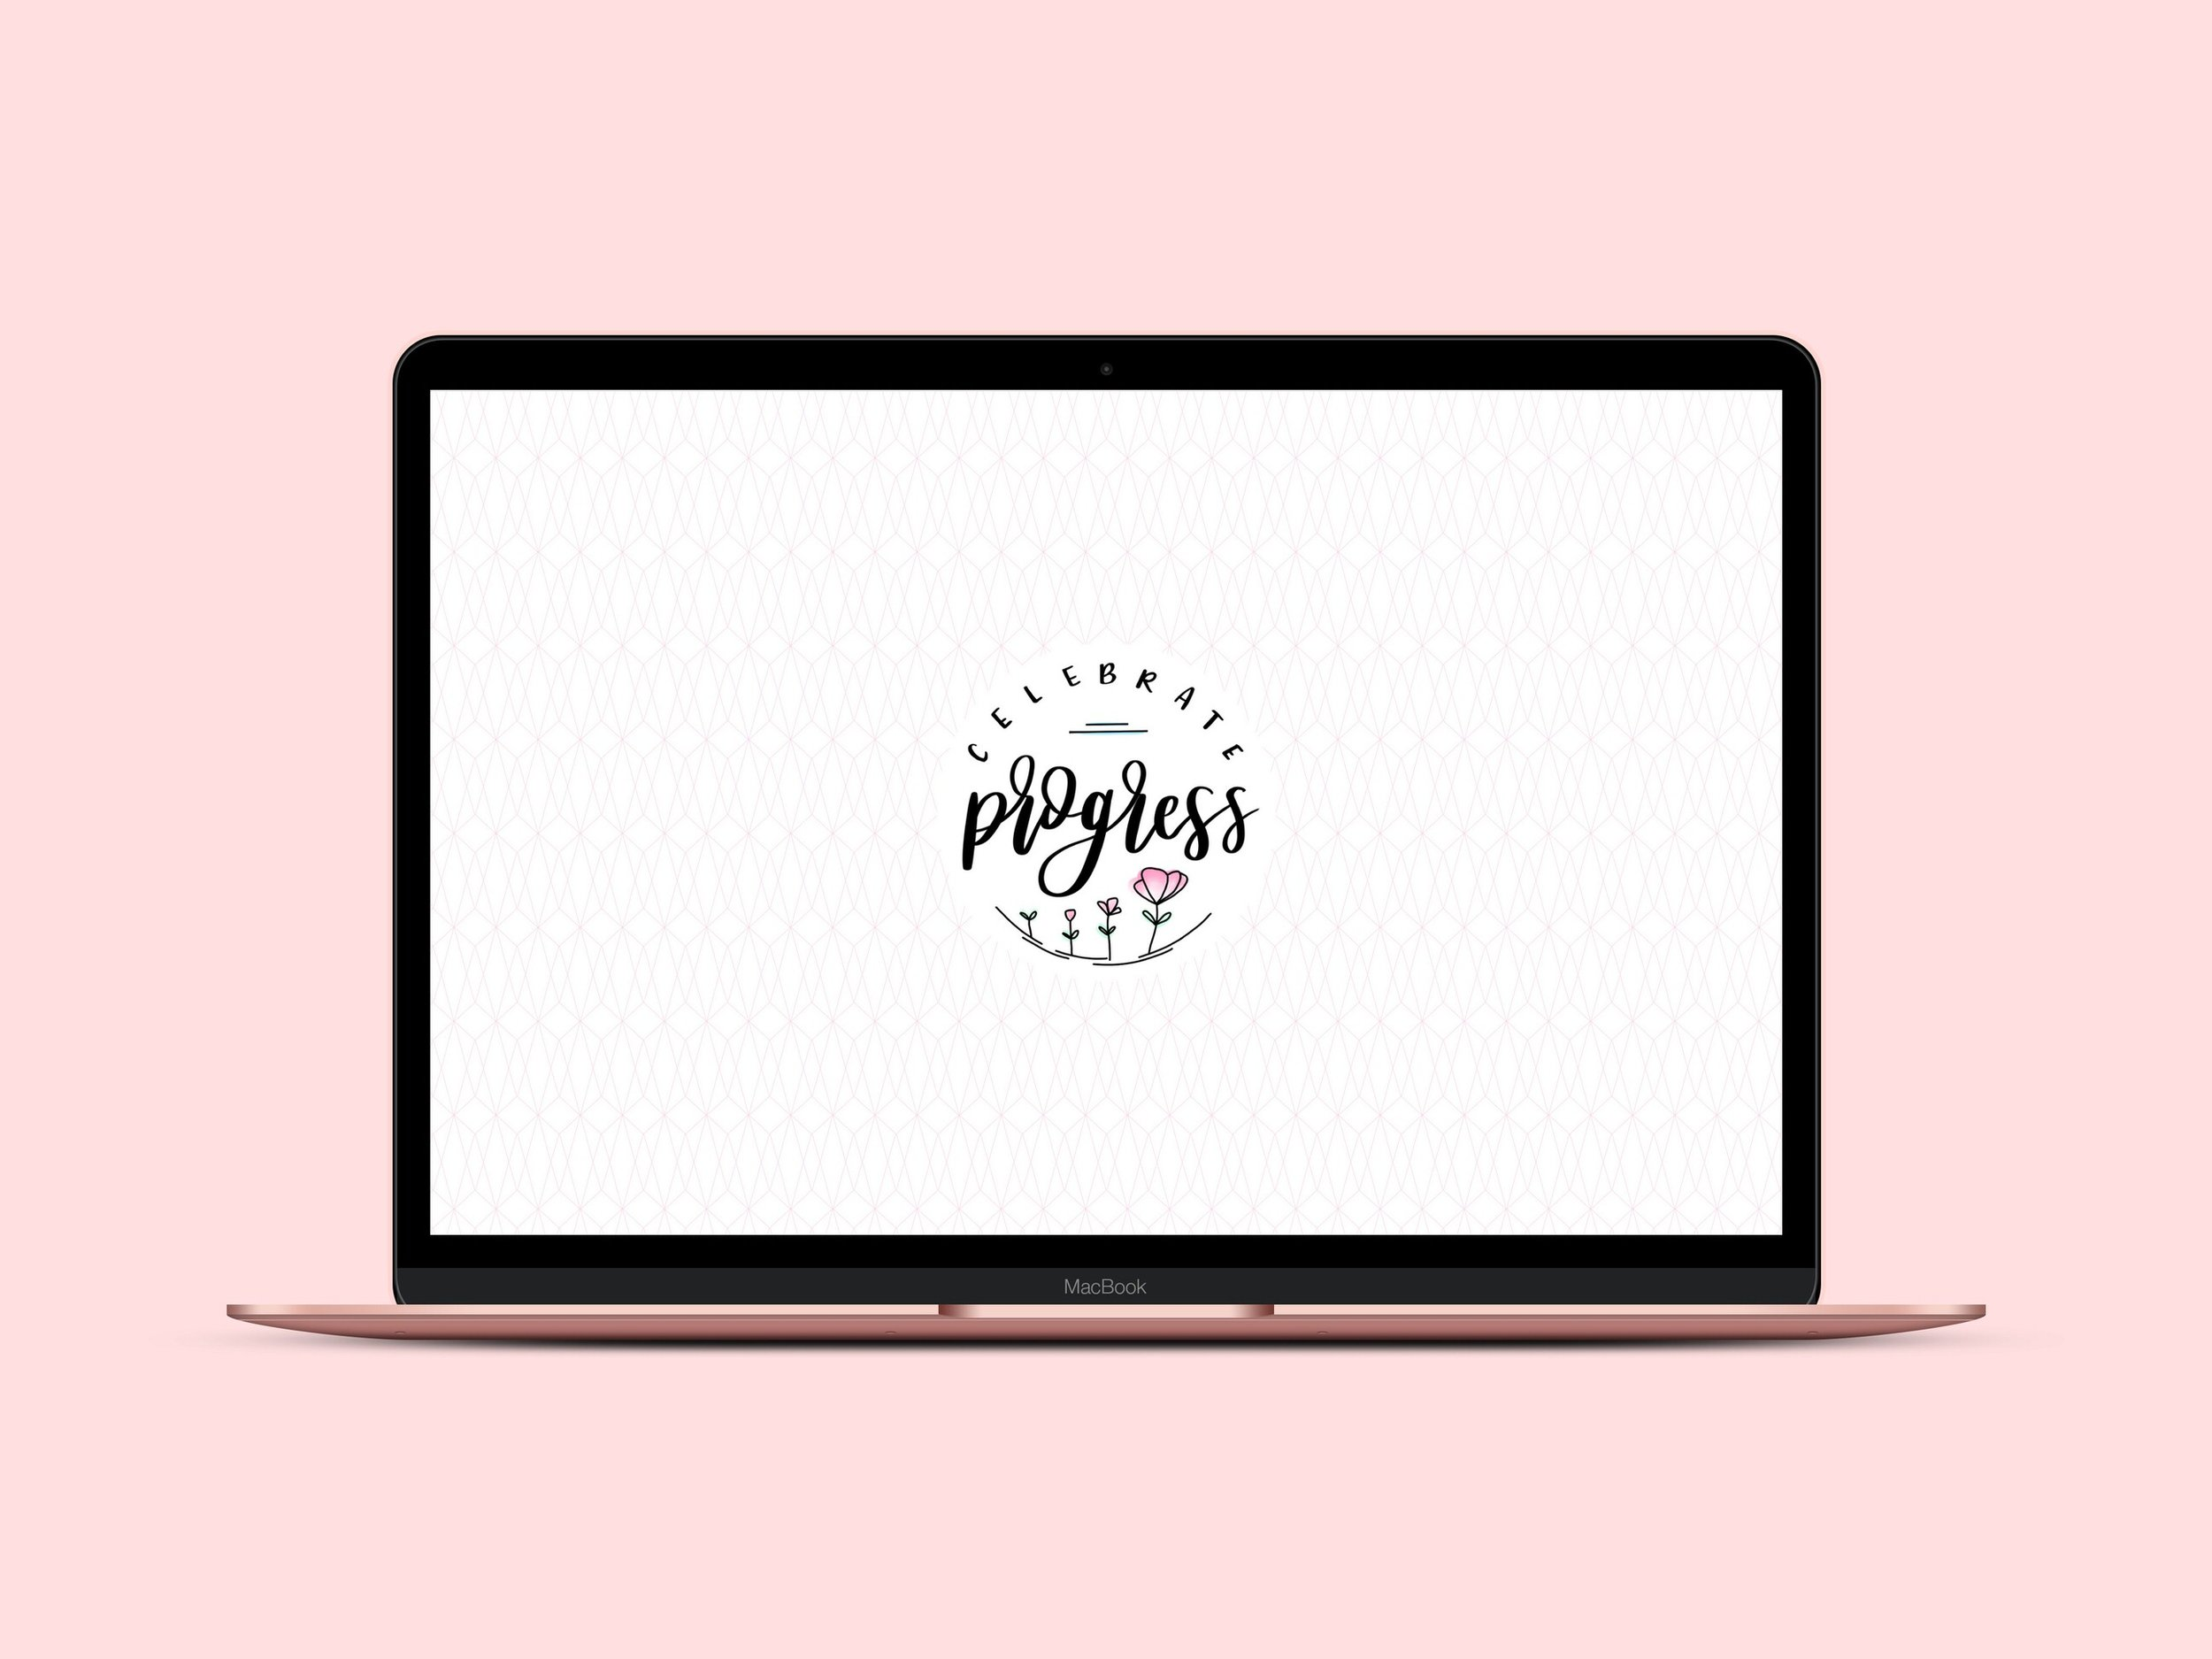 CelebrateProgress_Macbook-1.jpeg